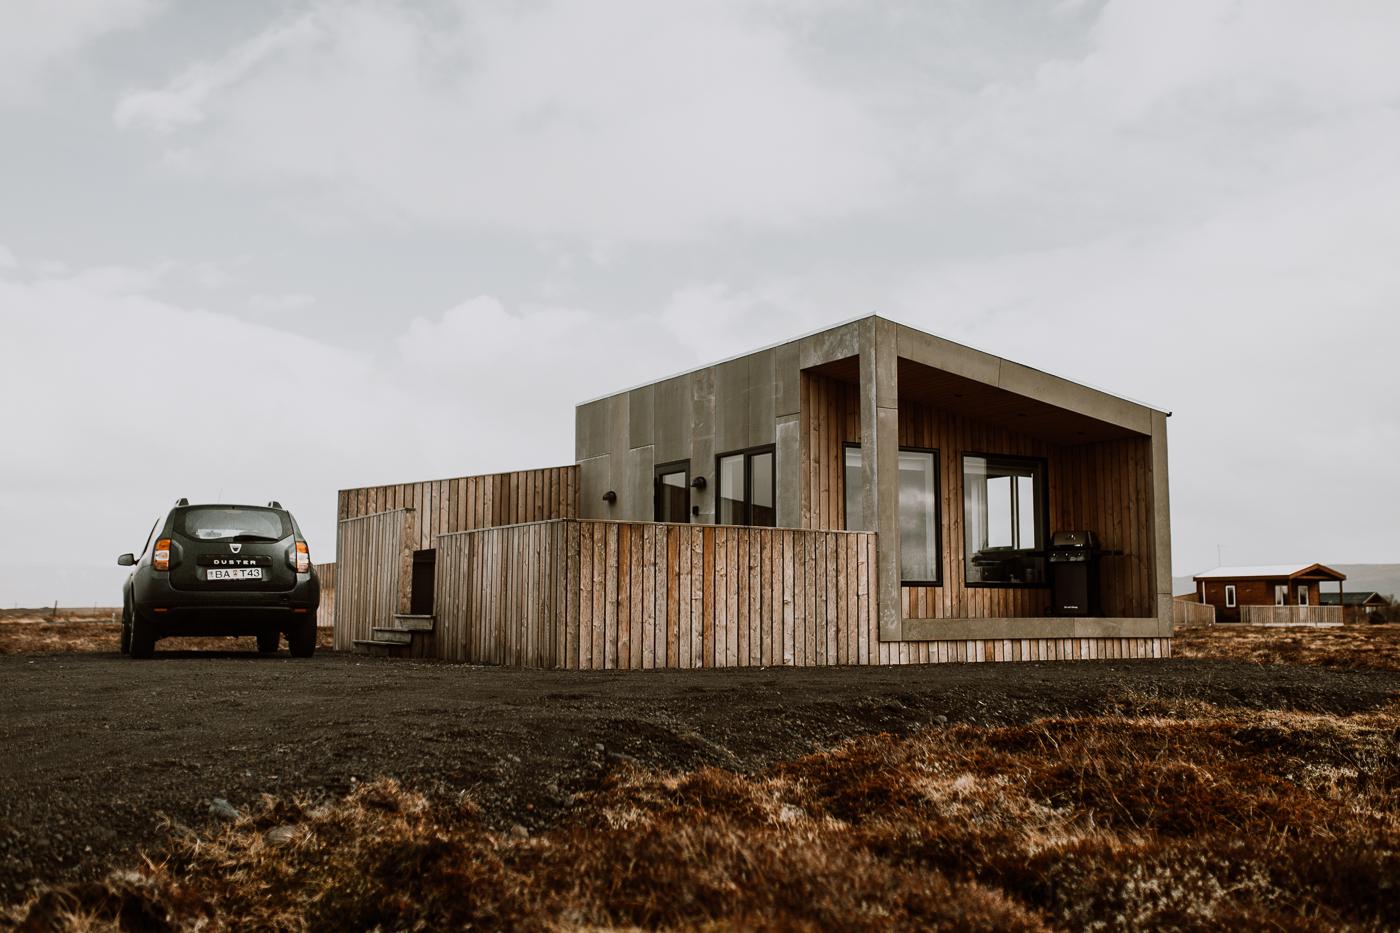 Golden Circle Cabin, Laugarvatn - £154.92 per night